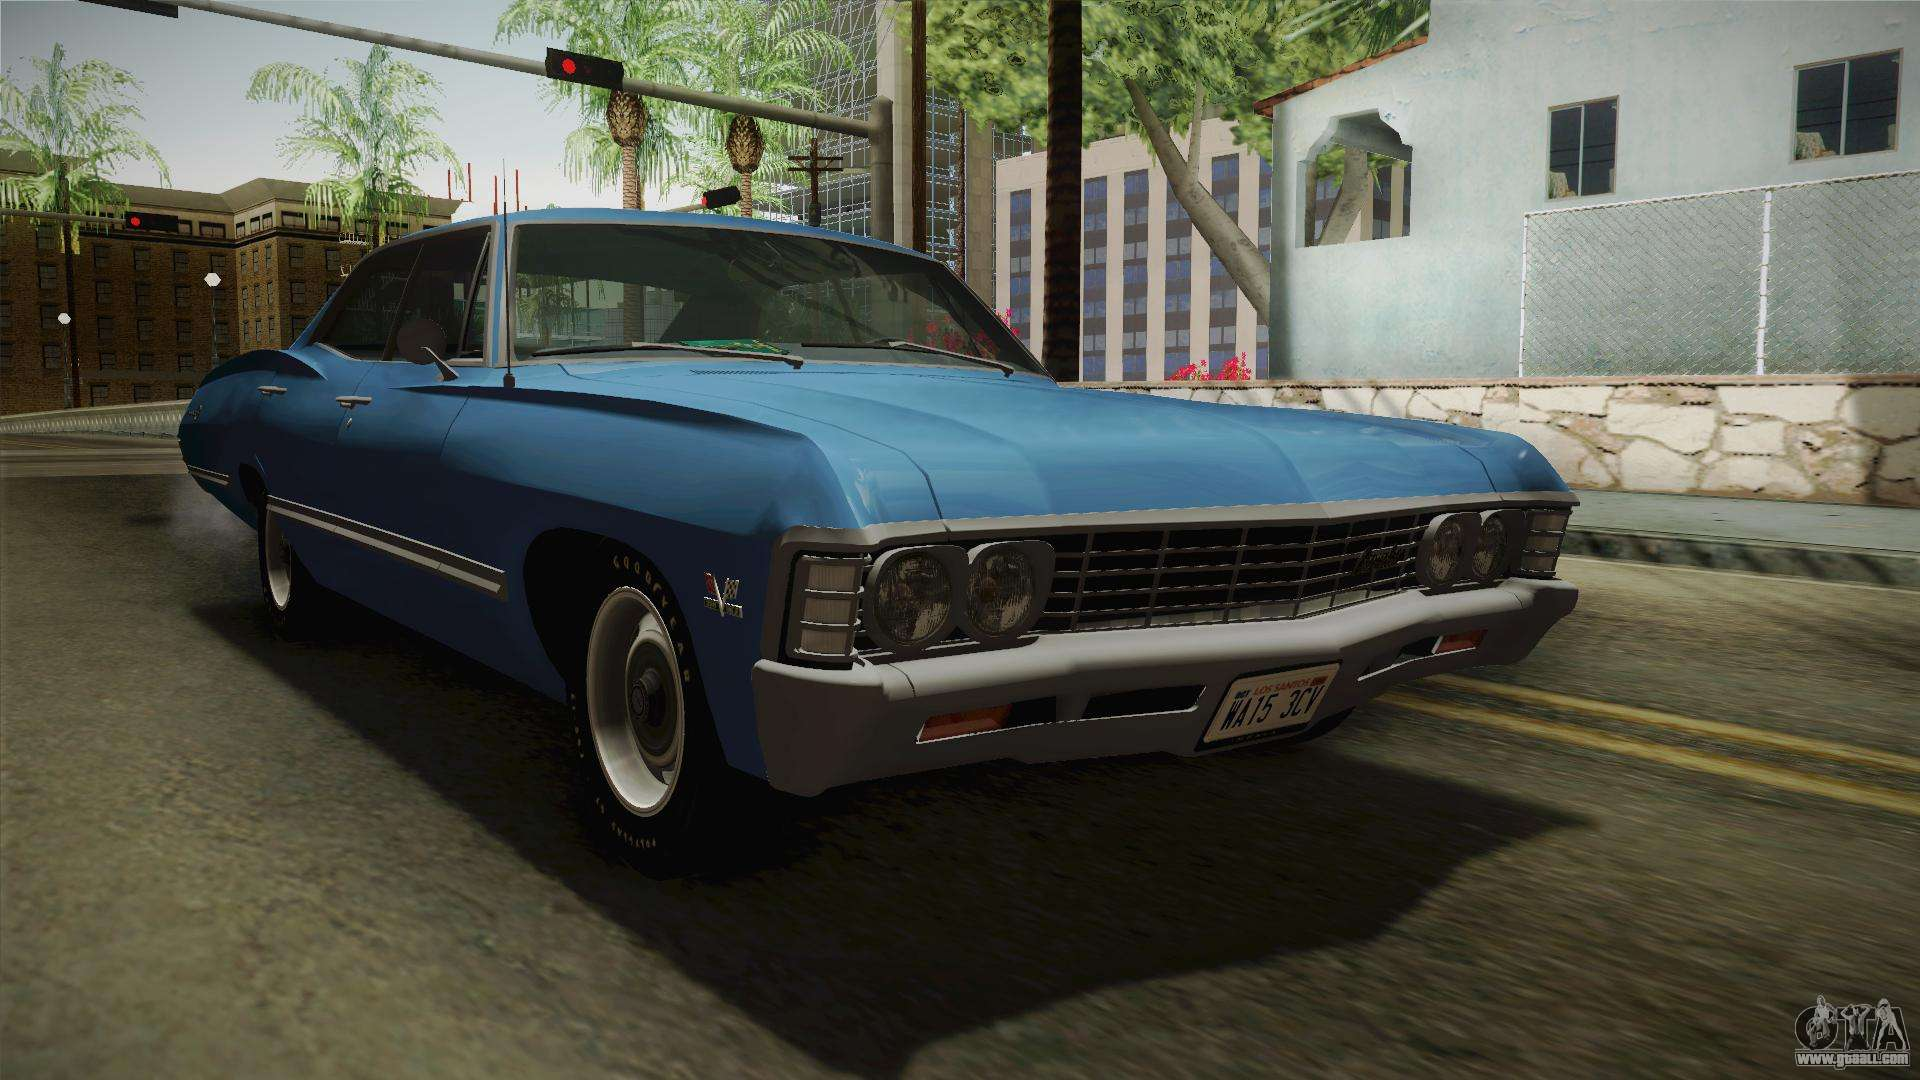 Chevrolet Impala Sport Sedan 396 Turbo Jet 1967 For Gta San Andreas